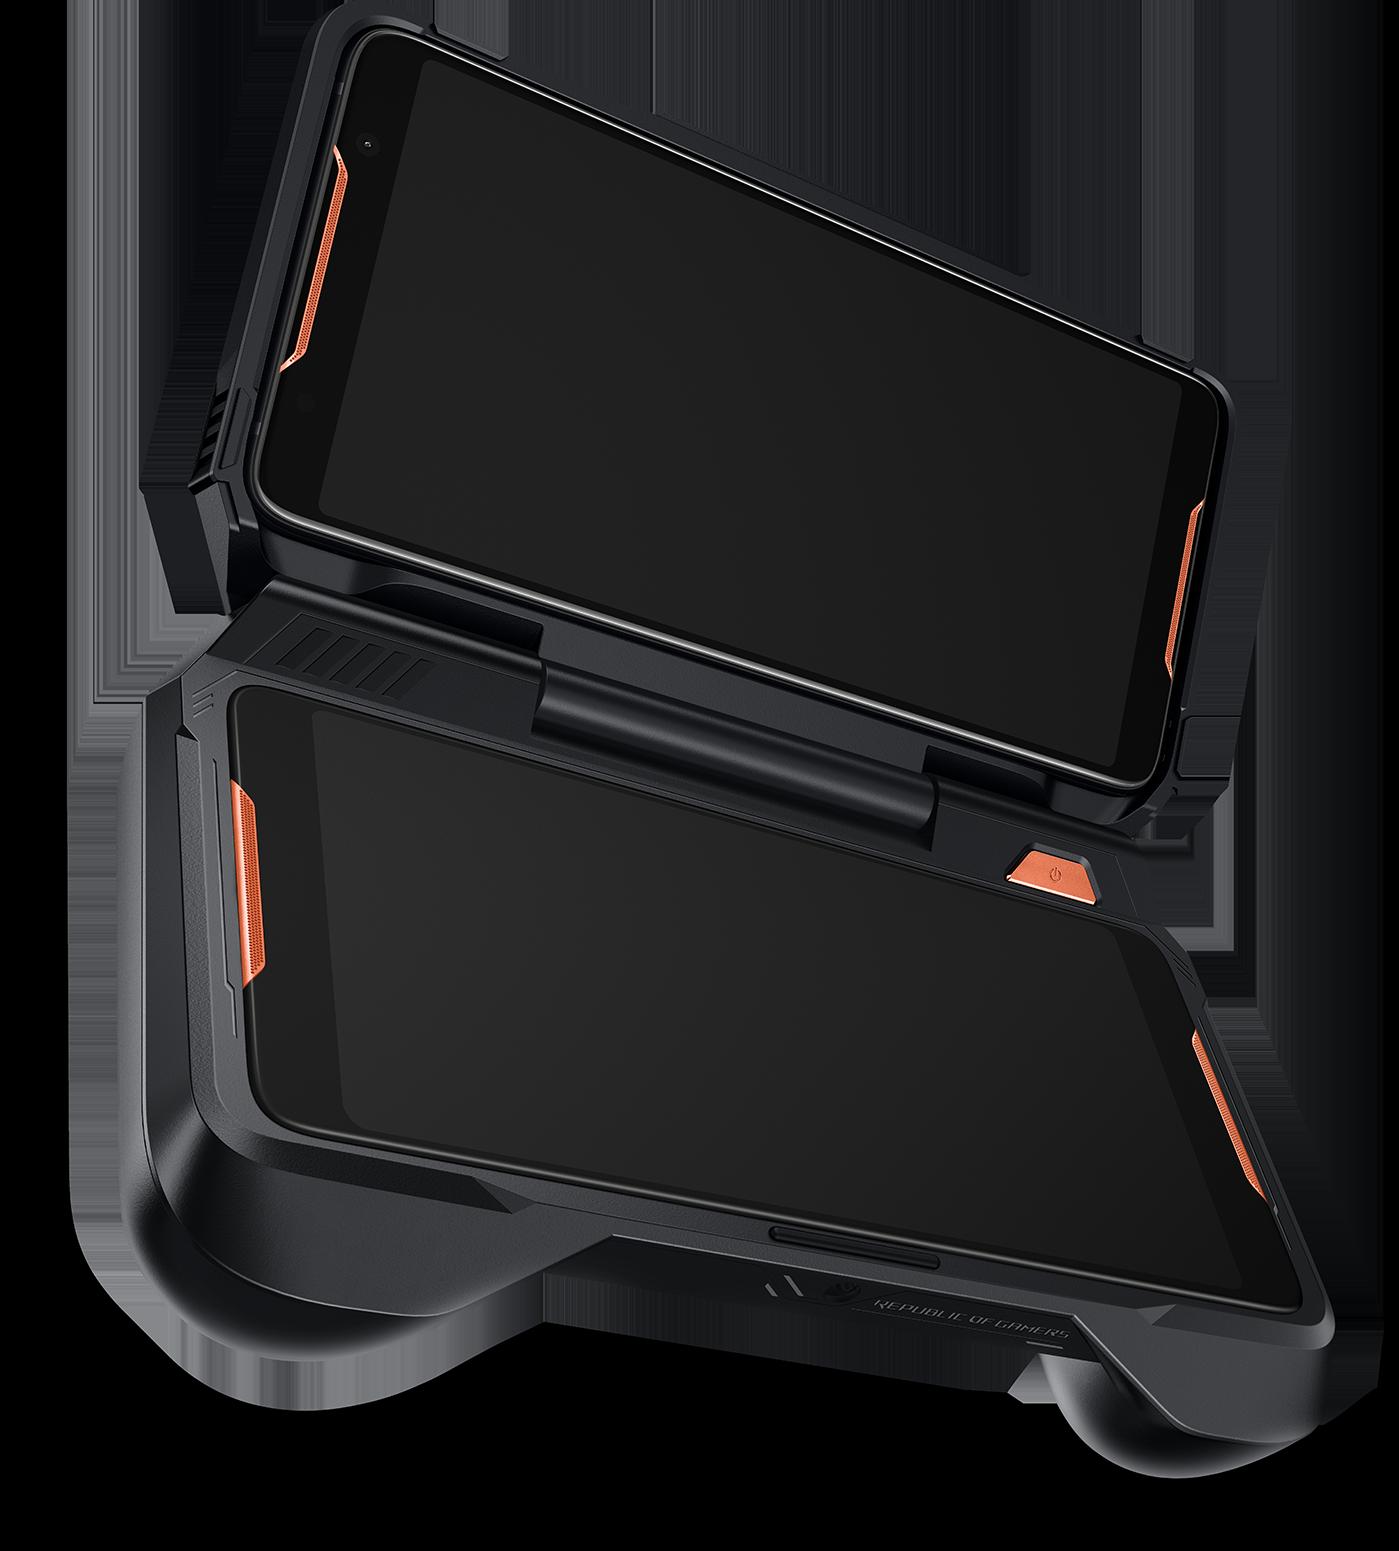 0c2c19c890f6 Buy ASUS ROG TwinView Dock - Microsoft Store en-CA